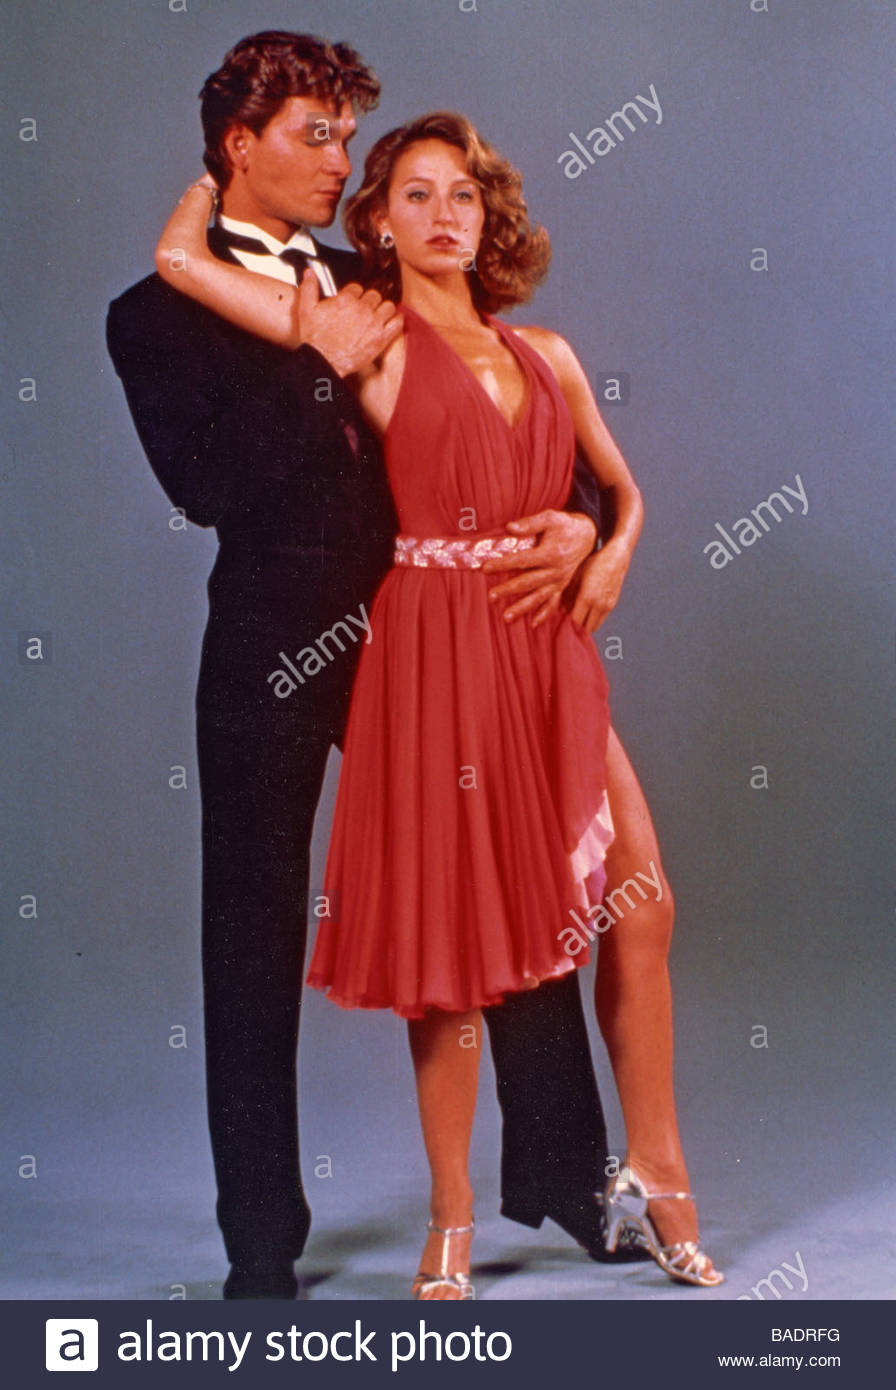 Dirty Dancing 1987 Vestron Film Mit Patrick Swayze Und Jennifer Grey